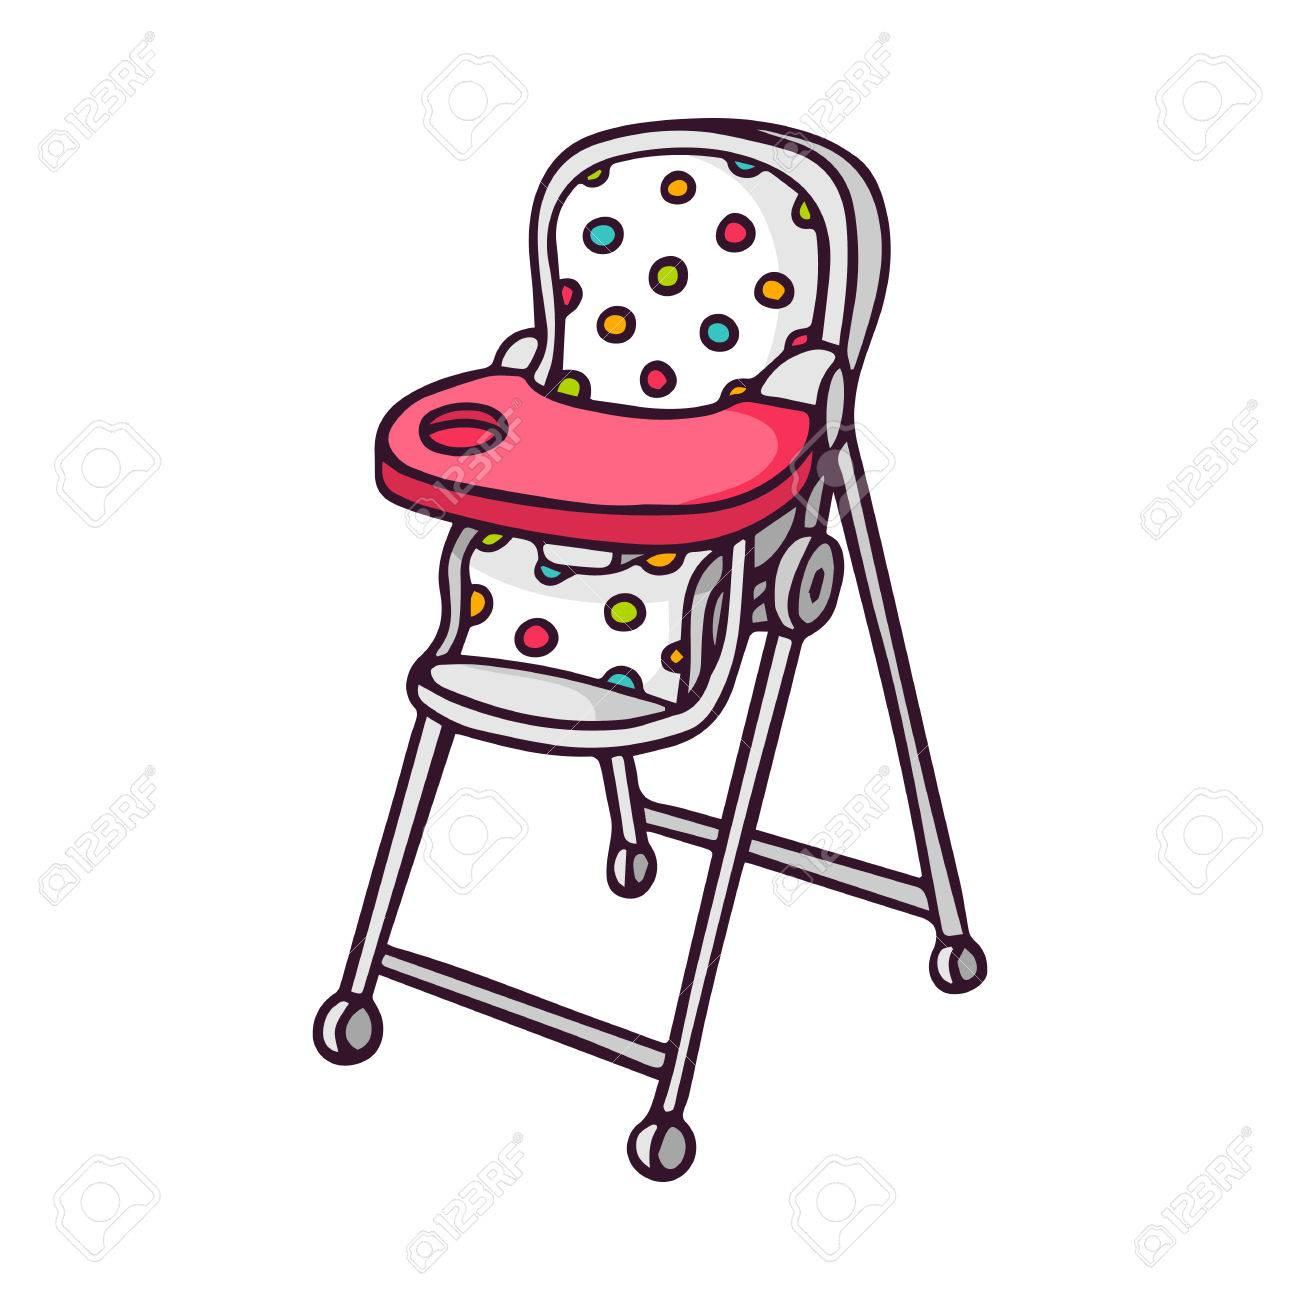 Baby feeding chair, bright vector children illustration of cute...